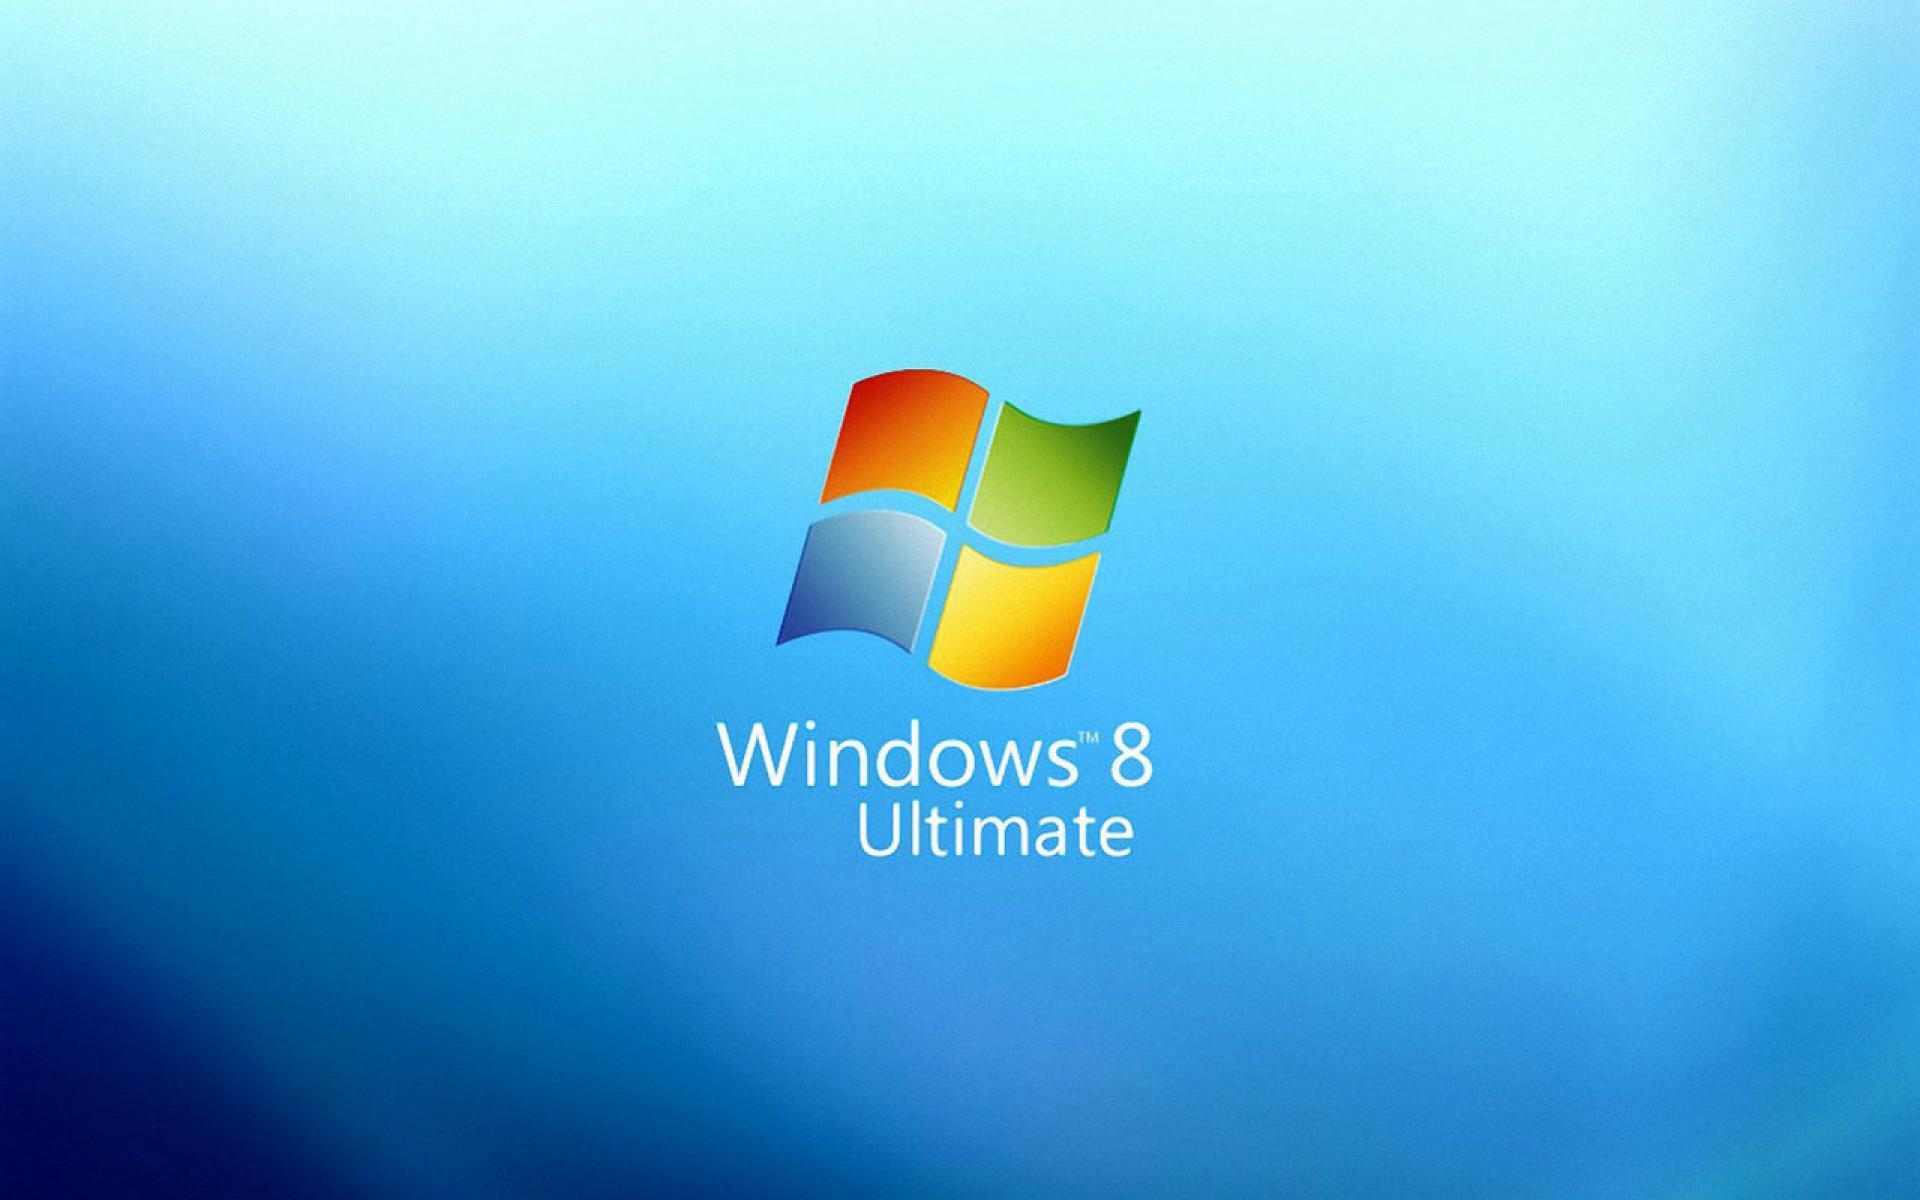 Windows 8 Wallpapers Windows 8 Wallpaper 6jpg 1920x1200 1920x1200